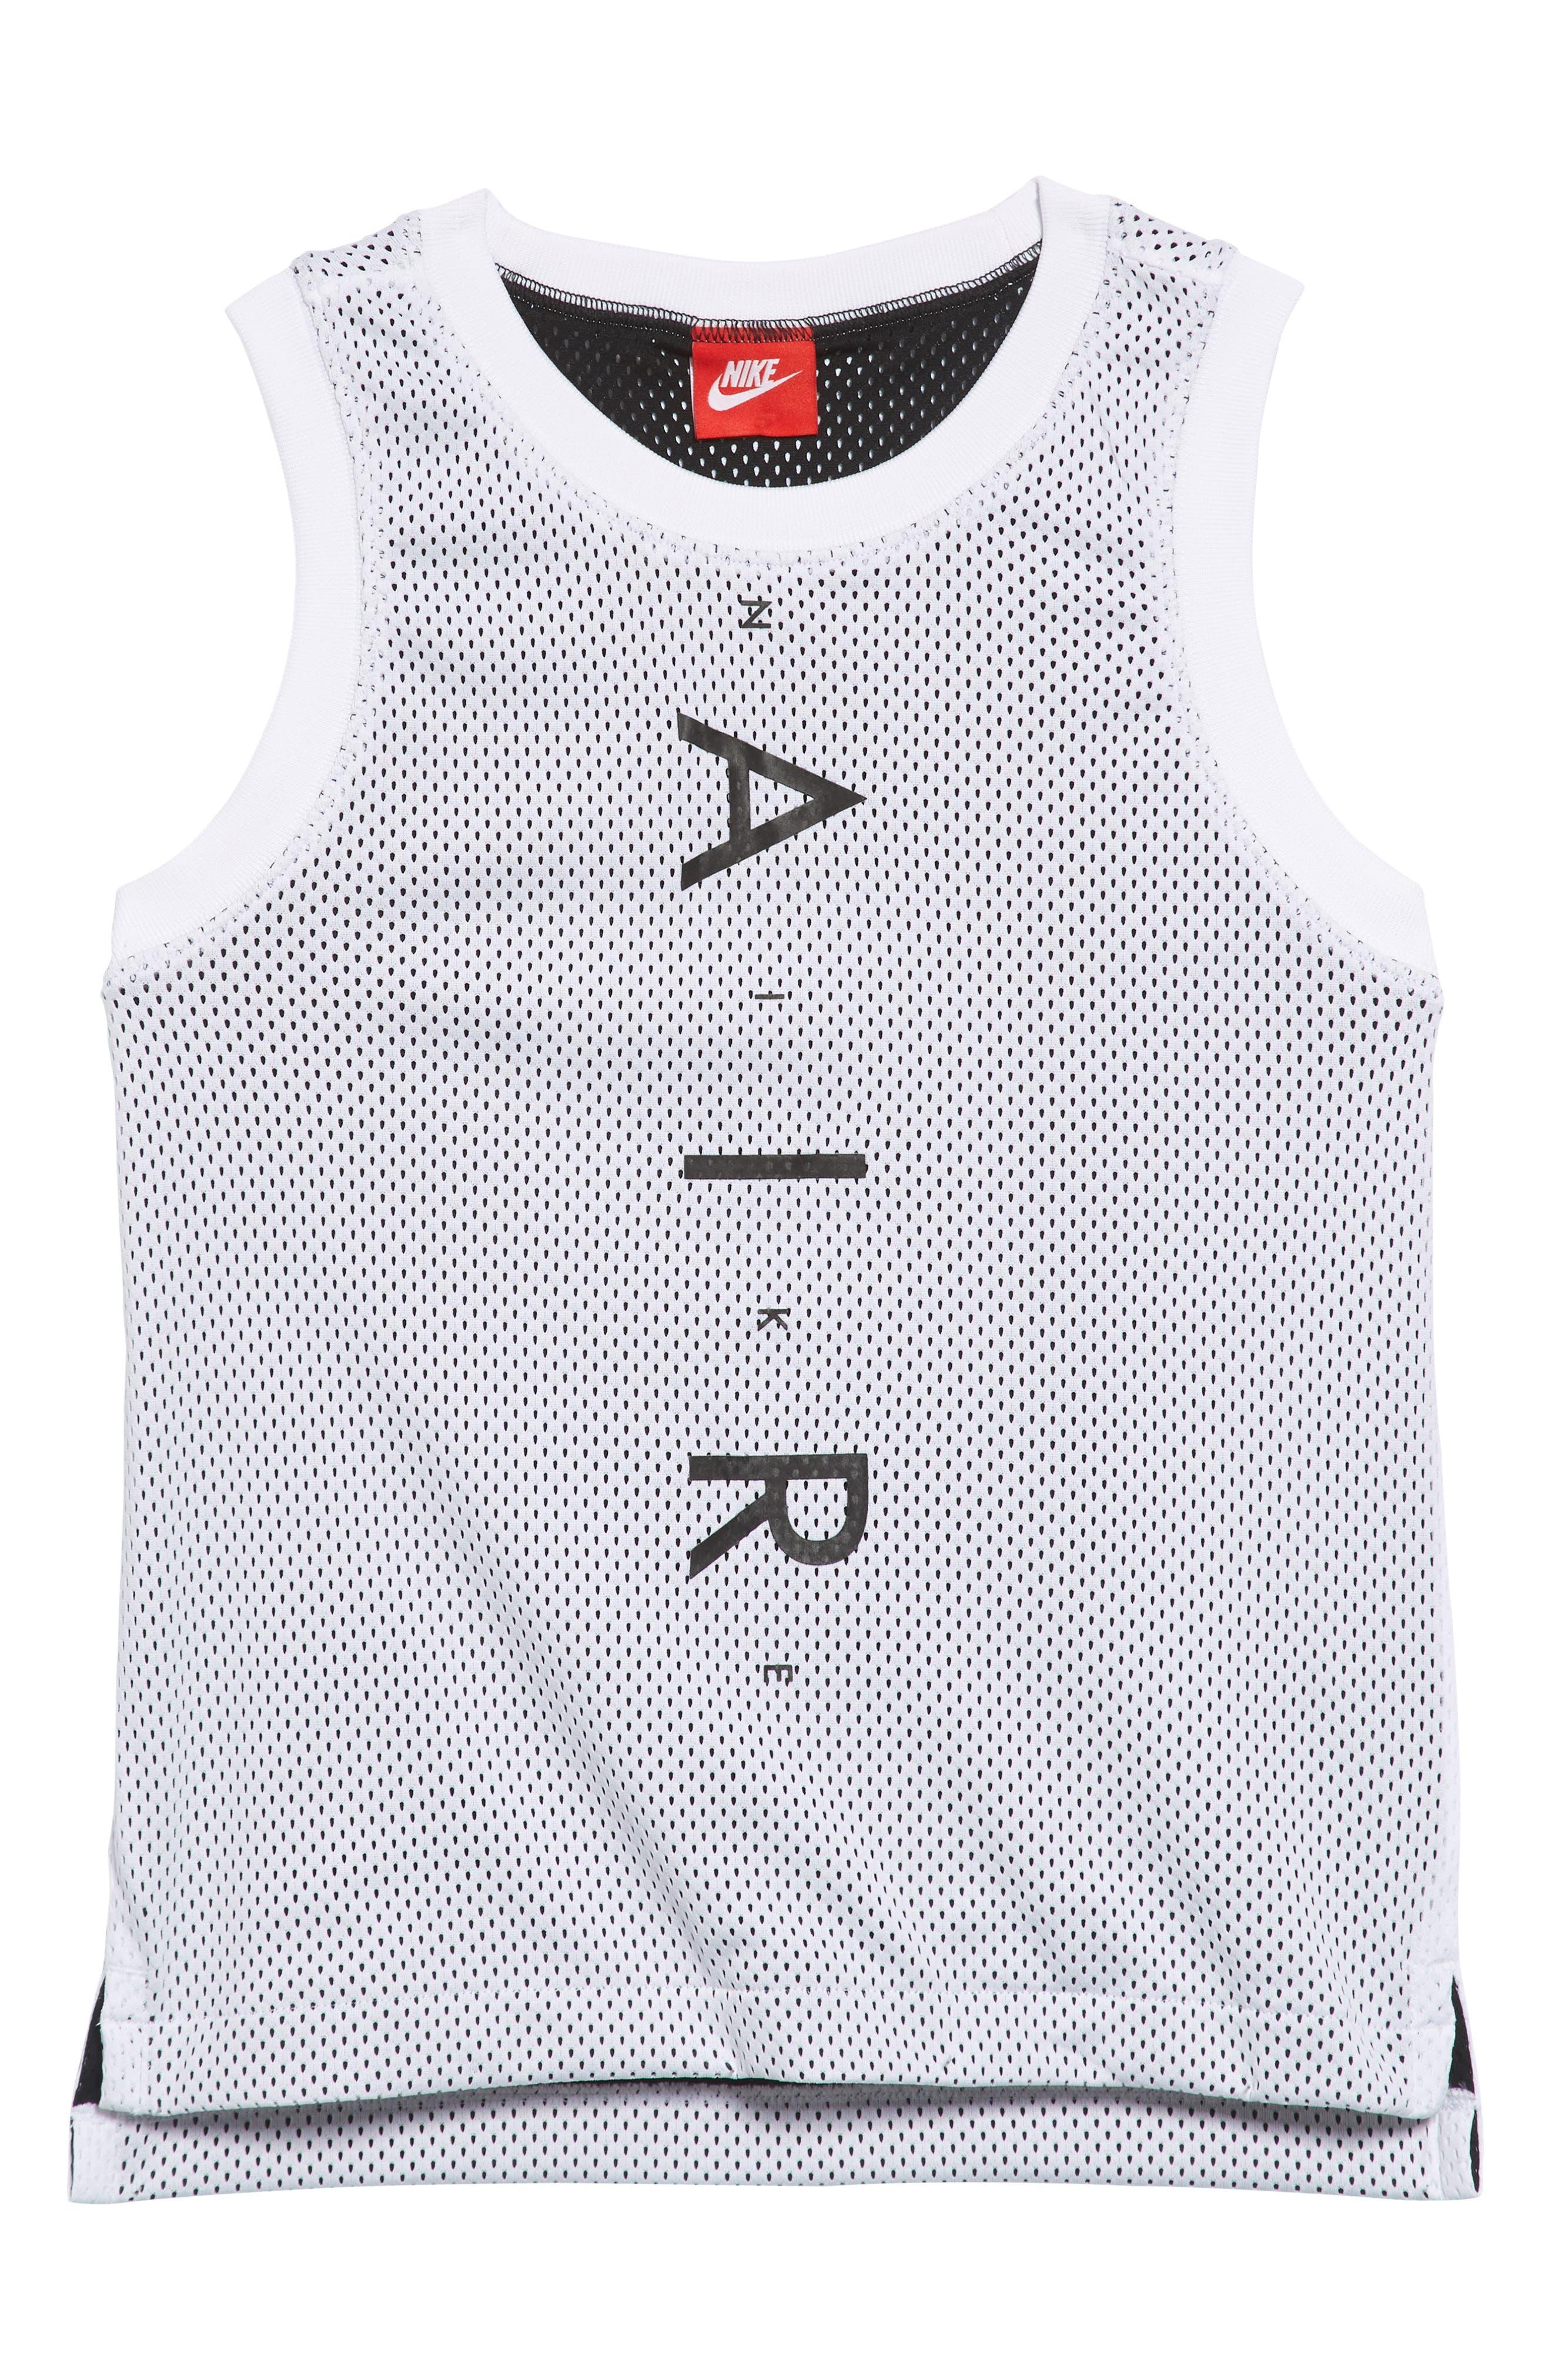 Air Dry Tank,                             Main thumbnail 1, color,                             White/ Black